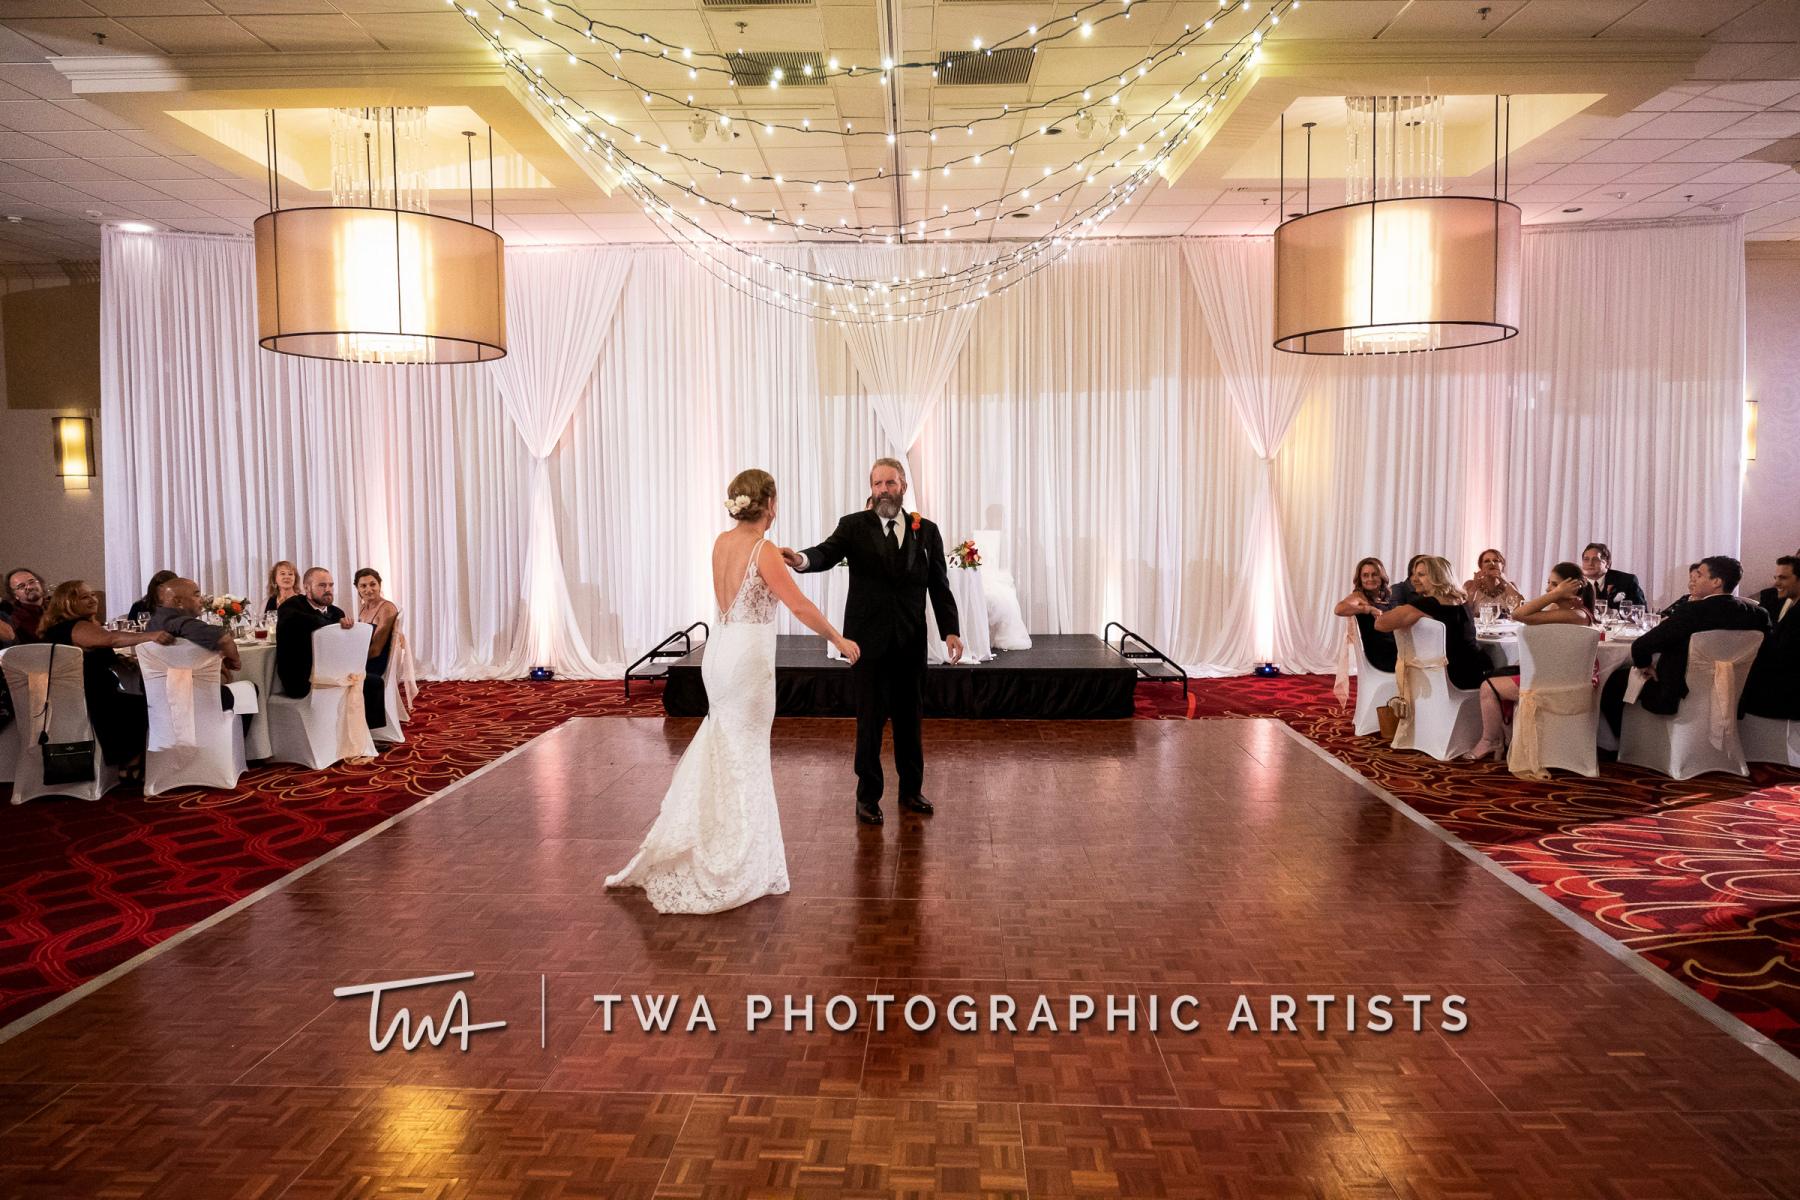 Chicago-Wedding-Photographers-Renaissance-Hotel_Hohensee_Fleishman_JG_DK-081-0609